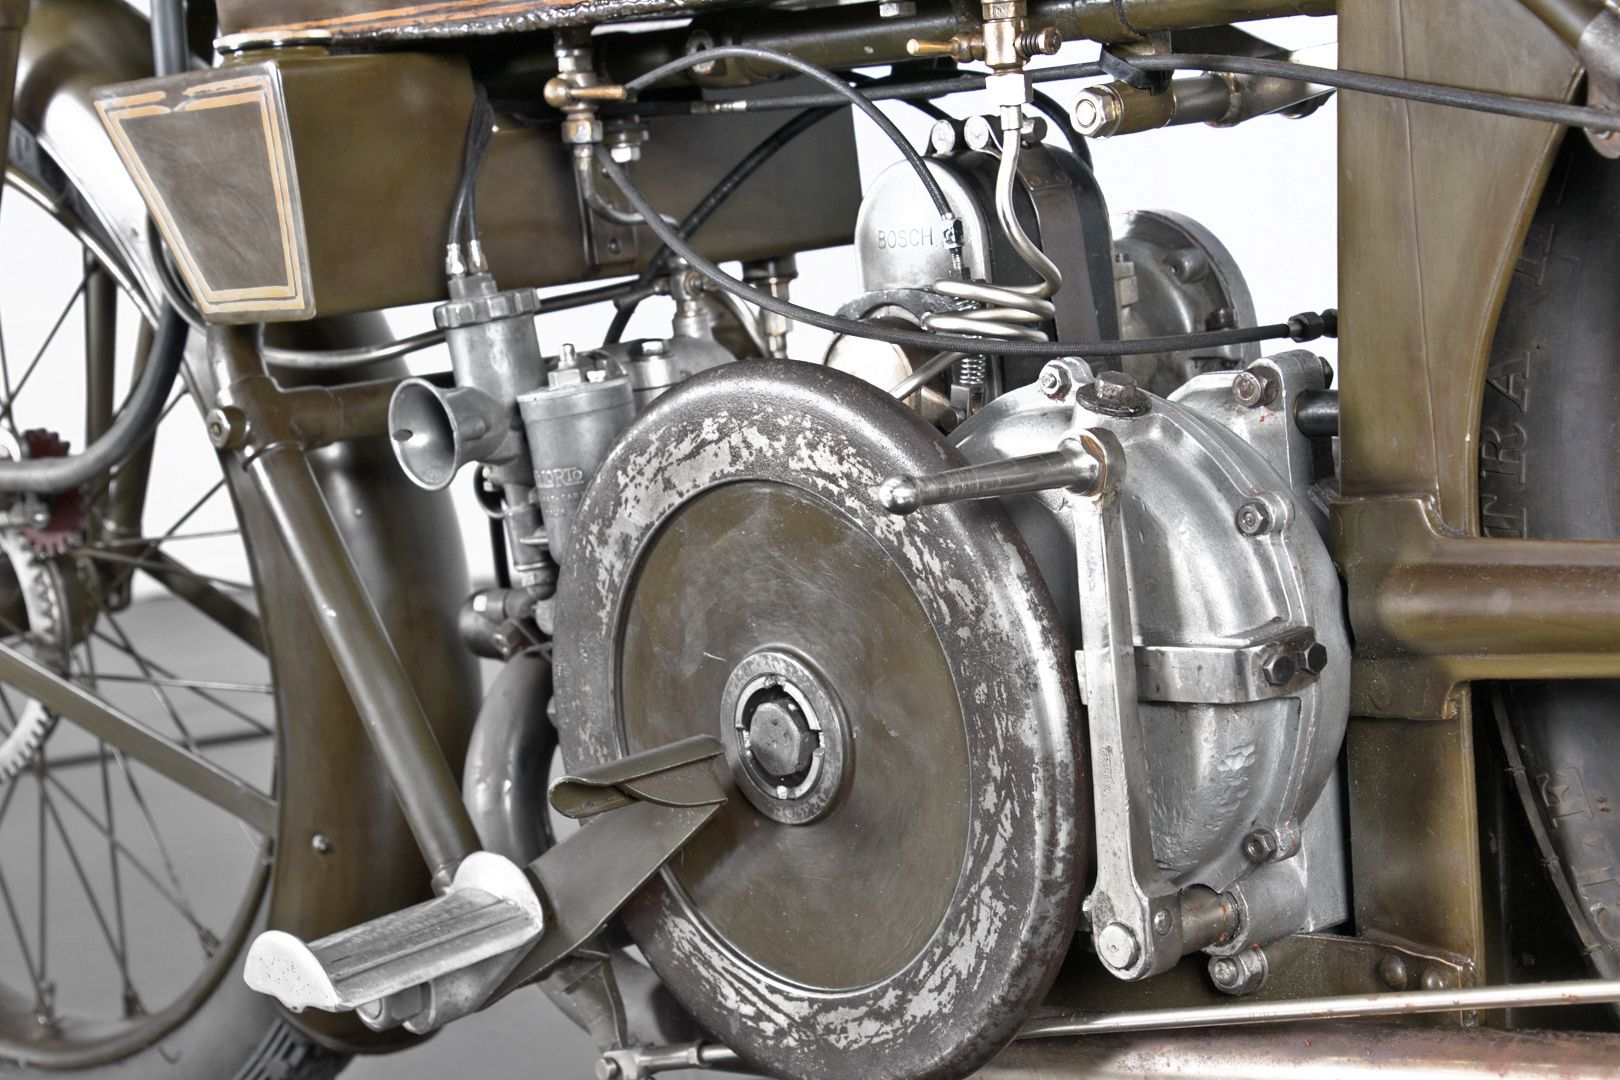 1924 Moto Guzzi 500 Normale 36475